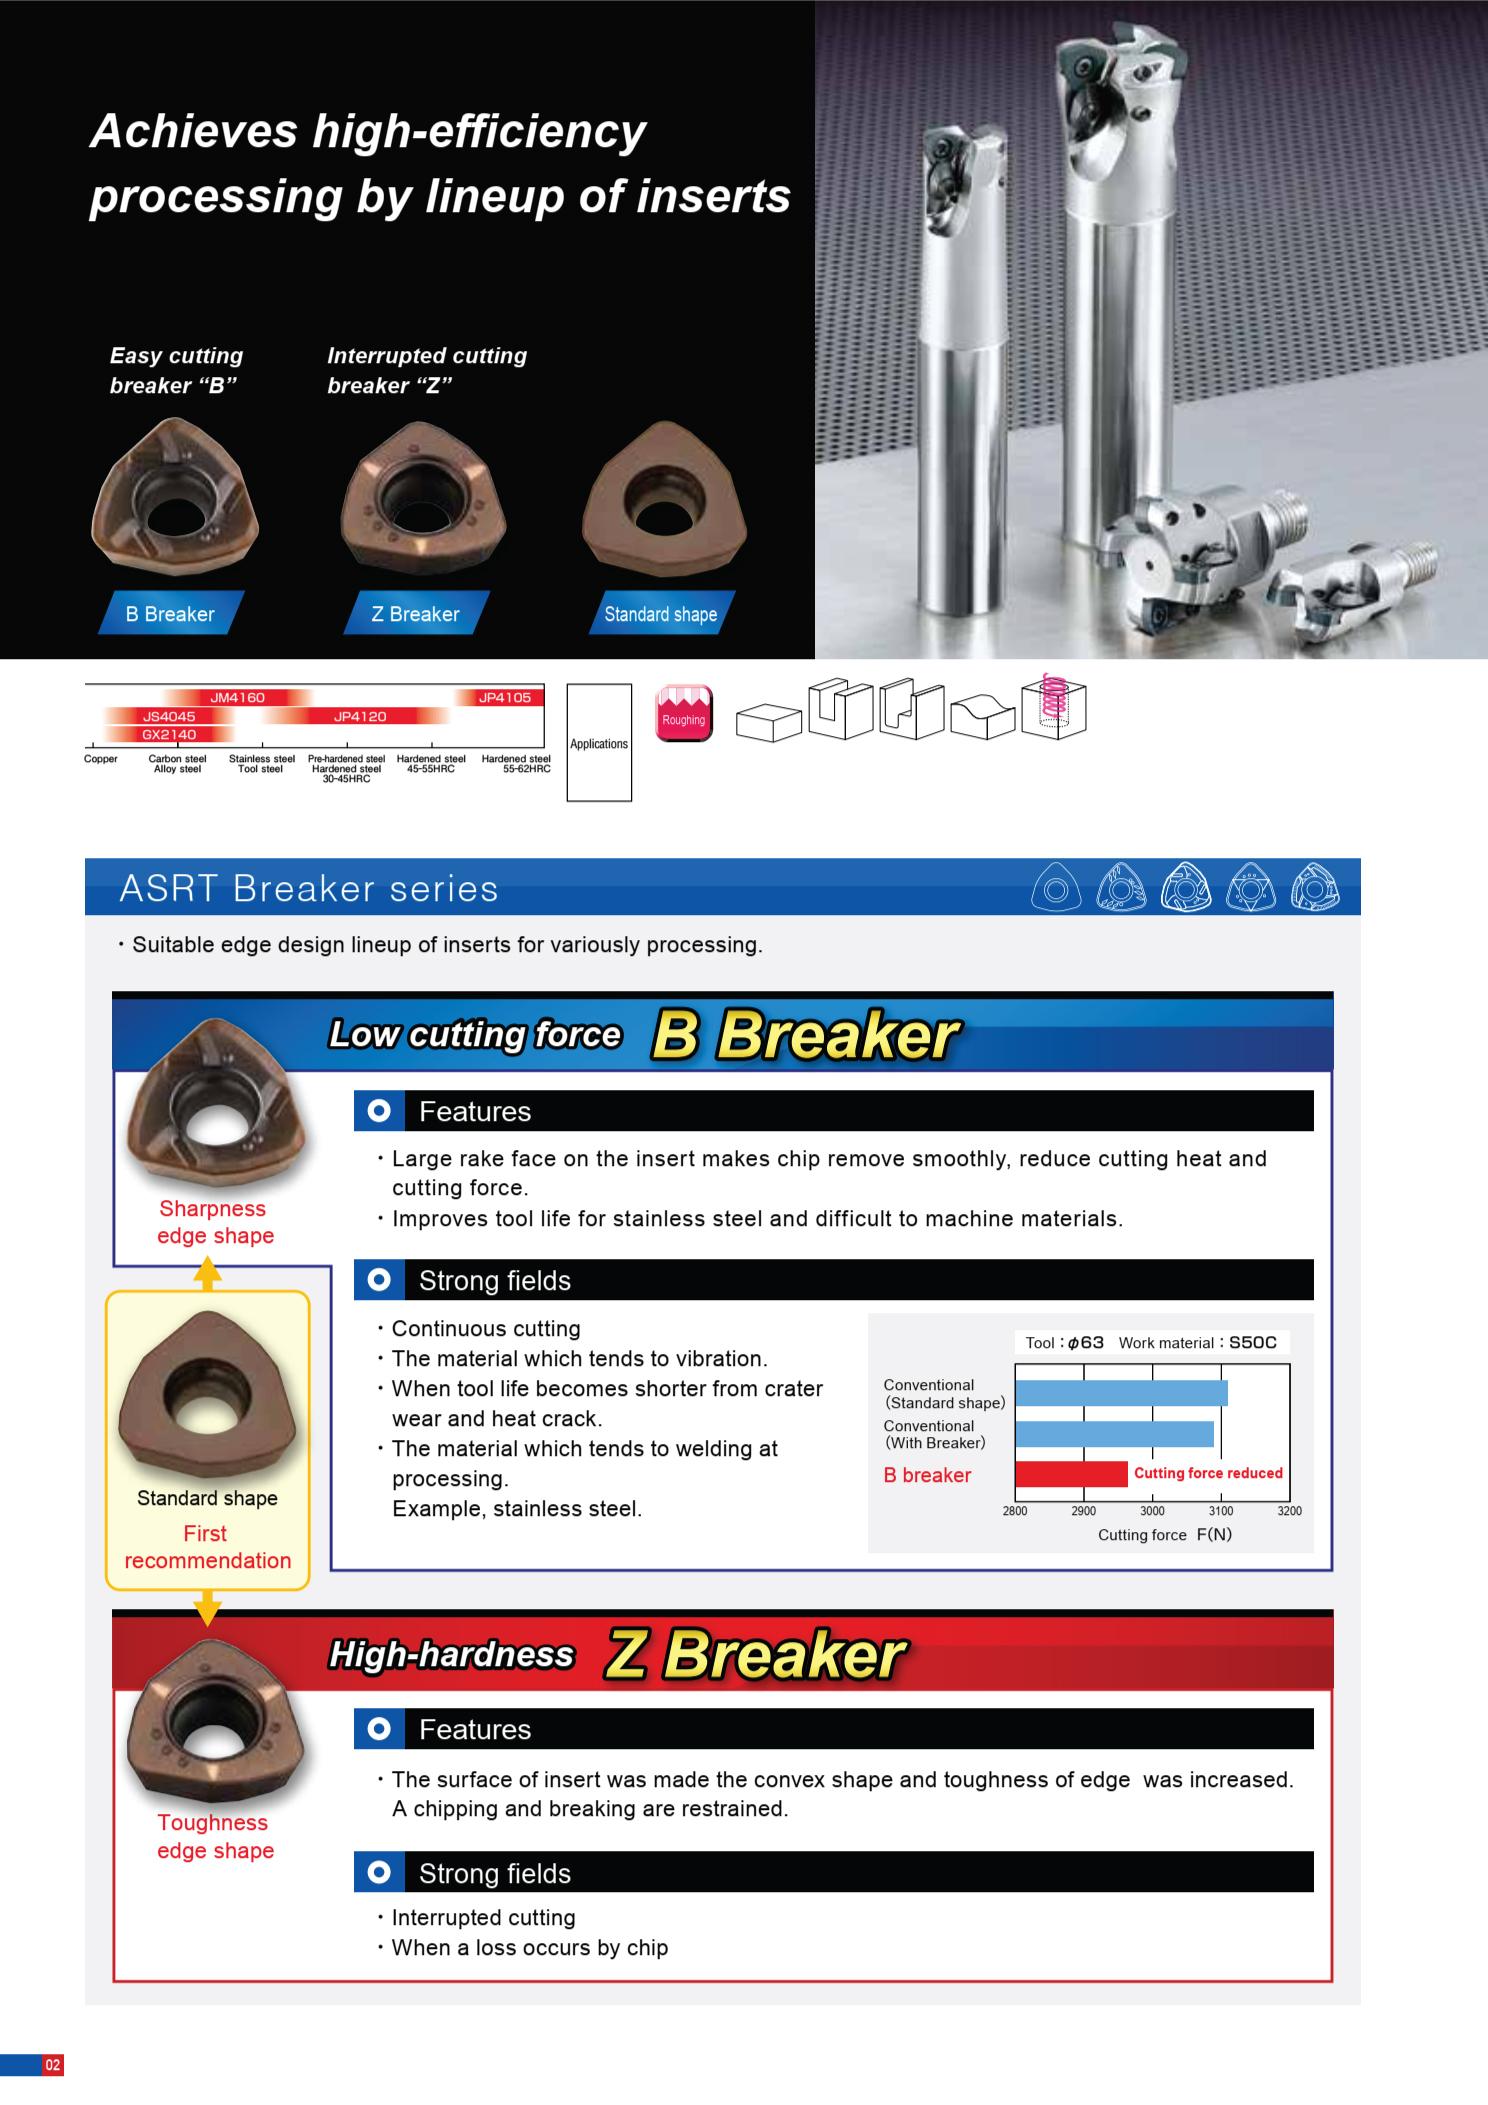 Dao Phay Gắn MảnhDao Phay Gắn Mảnh Hitachi Moldino ASRT 2 Hitachi Moldino ASRF Mini 2